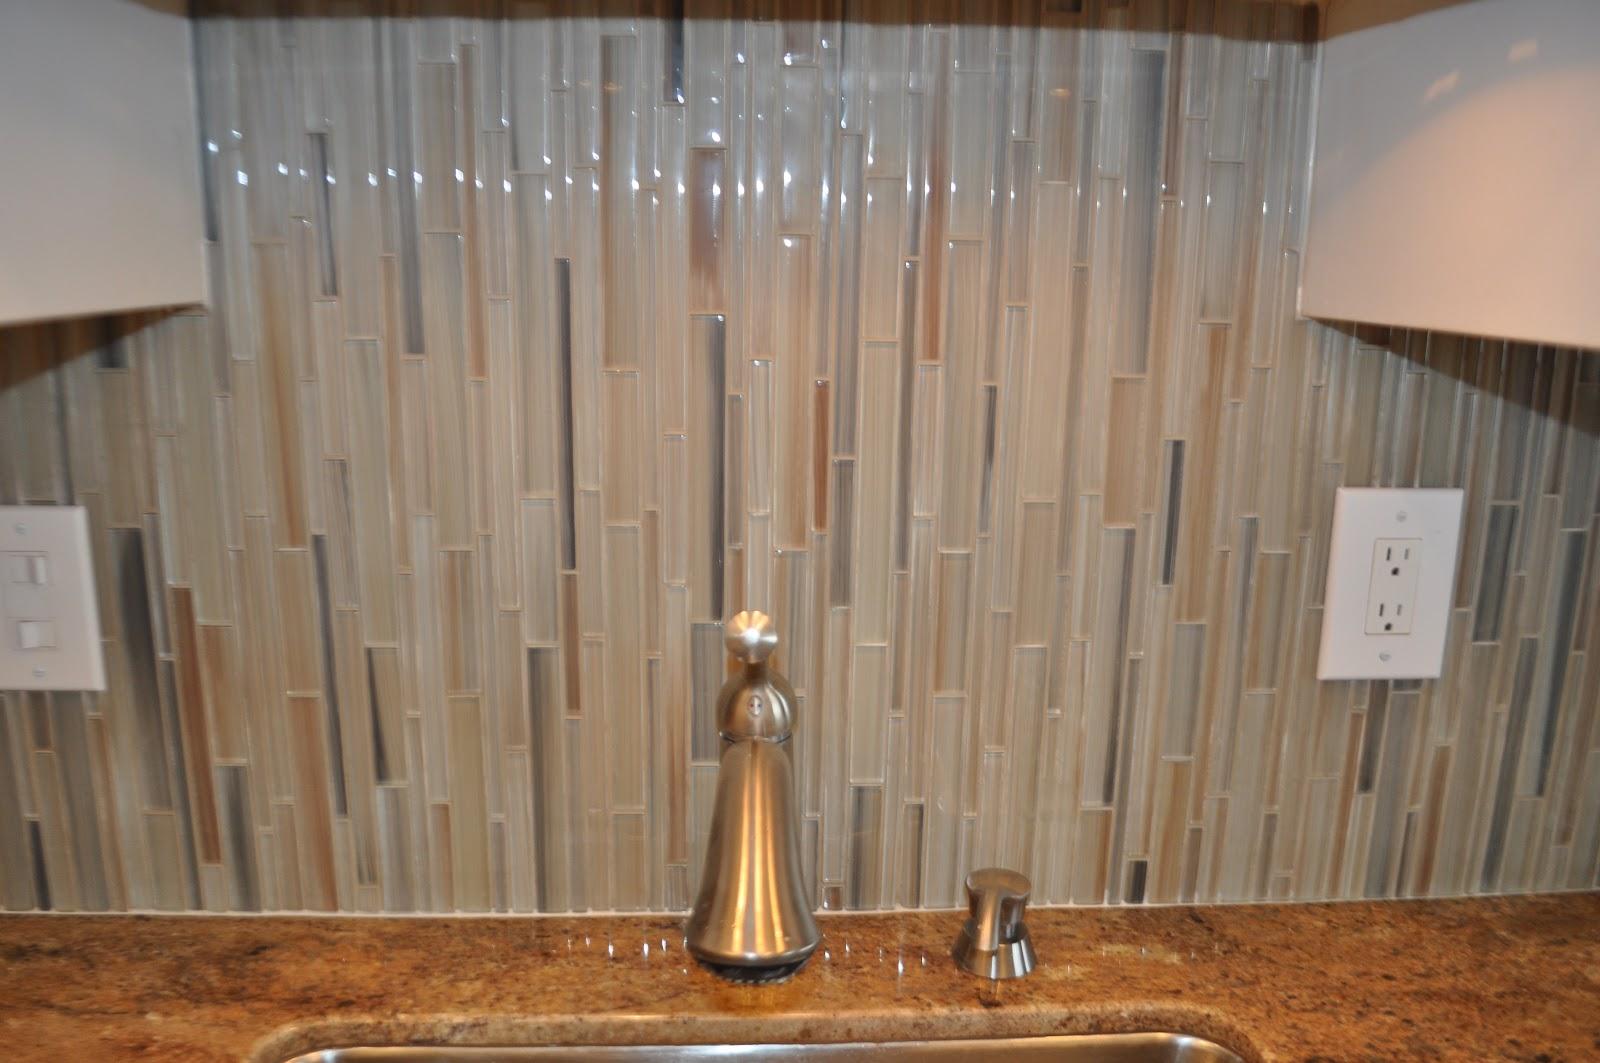 north kihei glass tile backsplash - Vertical Tile Backsplash